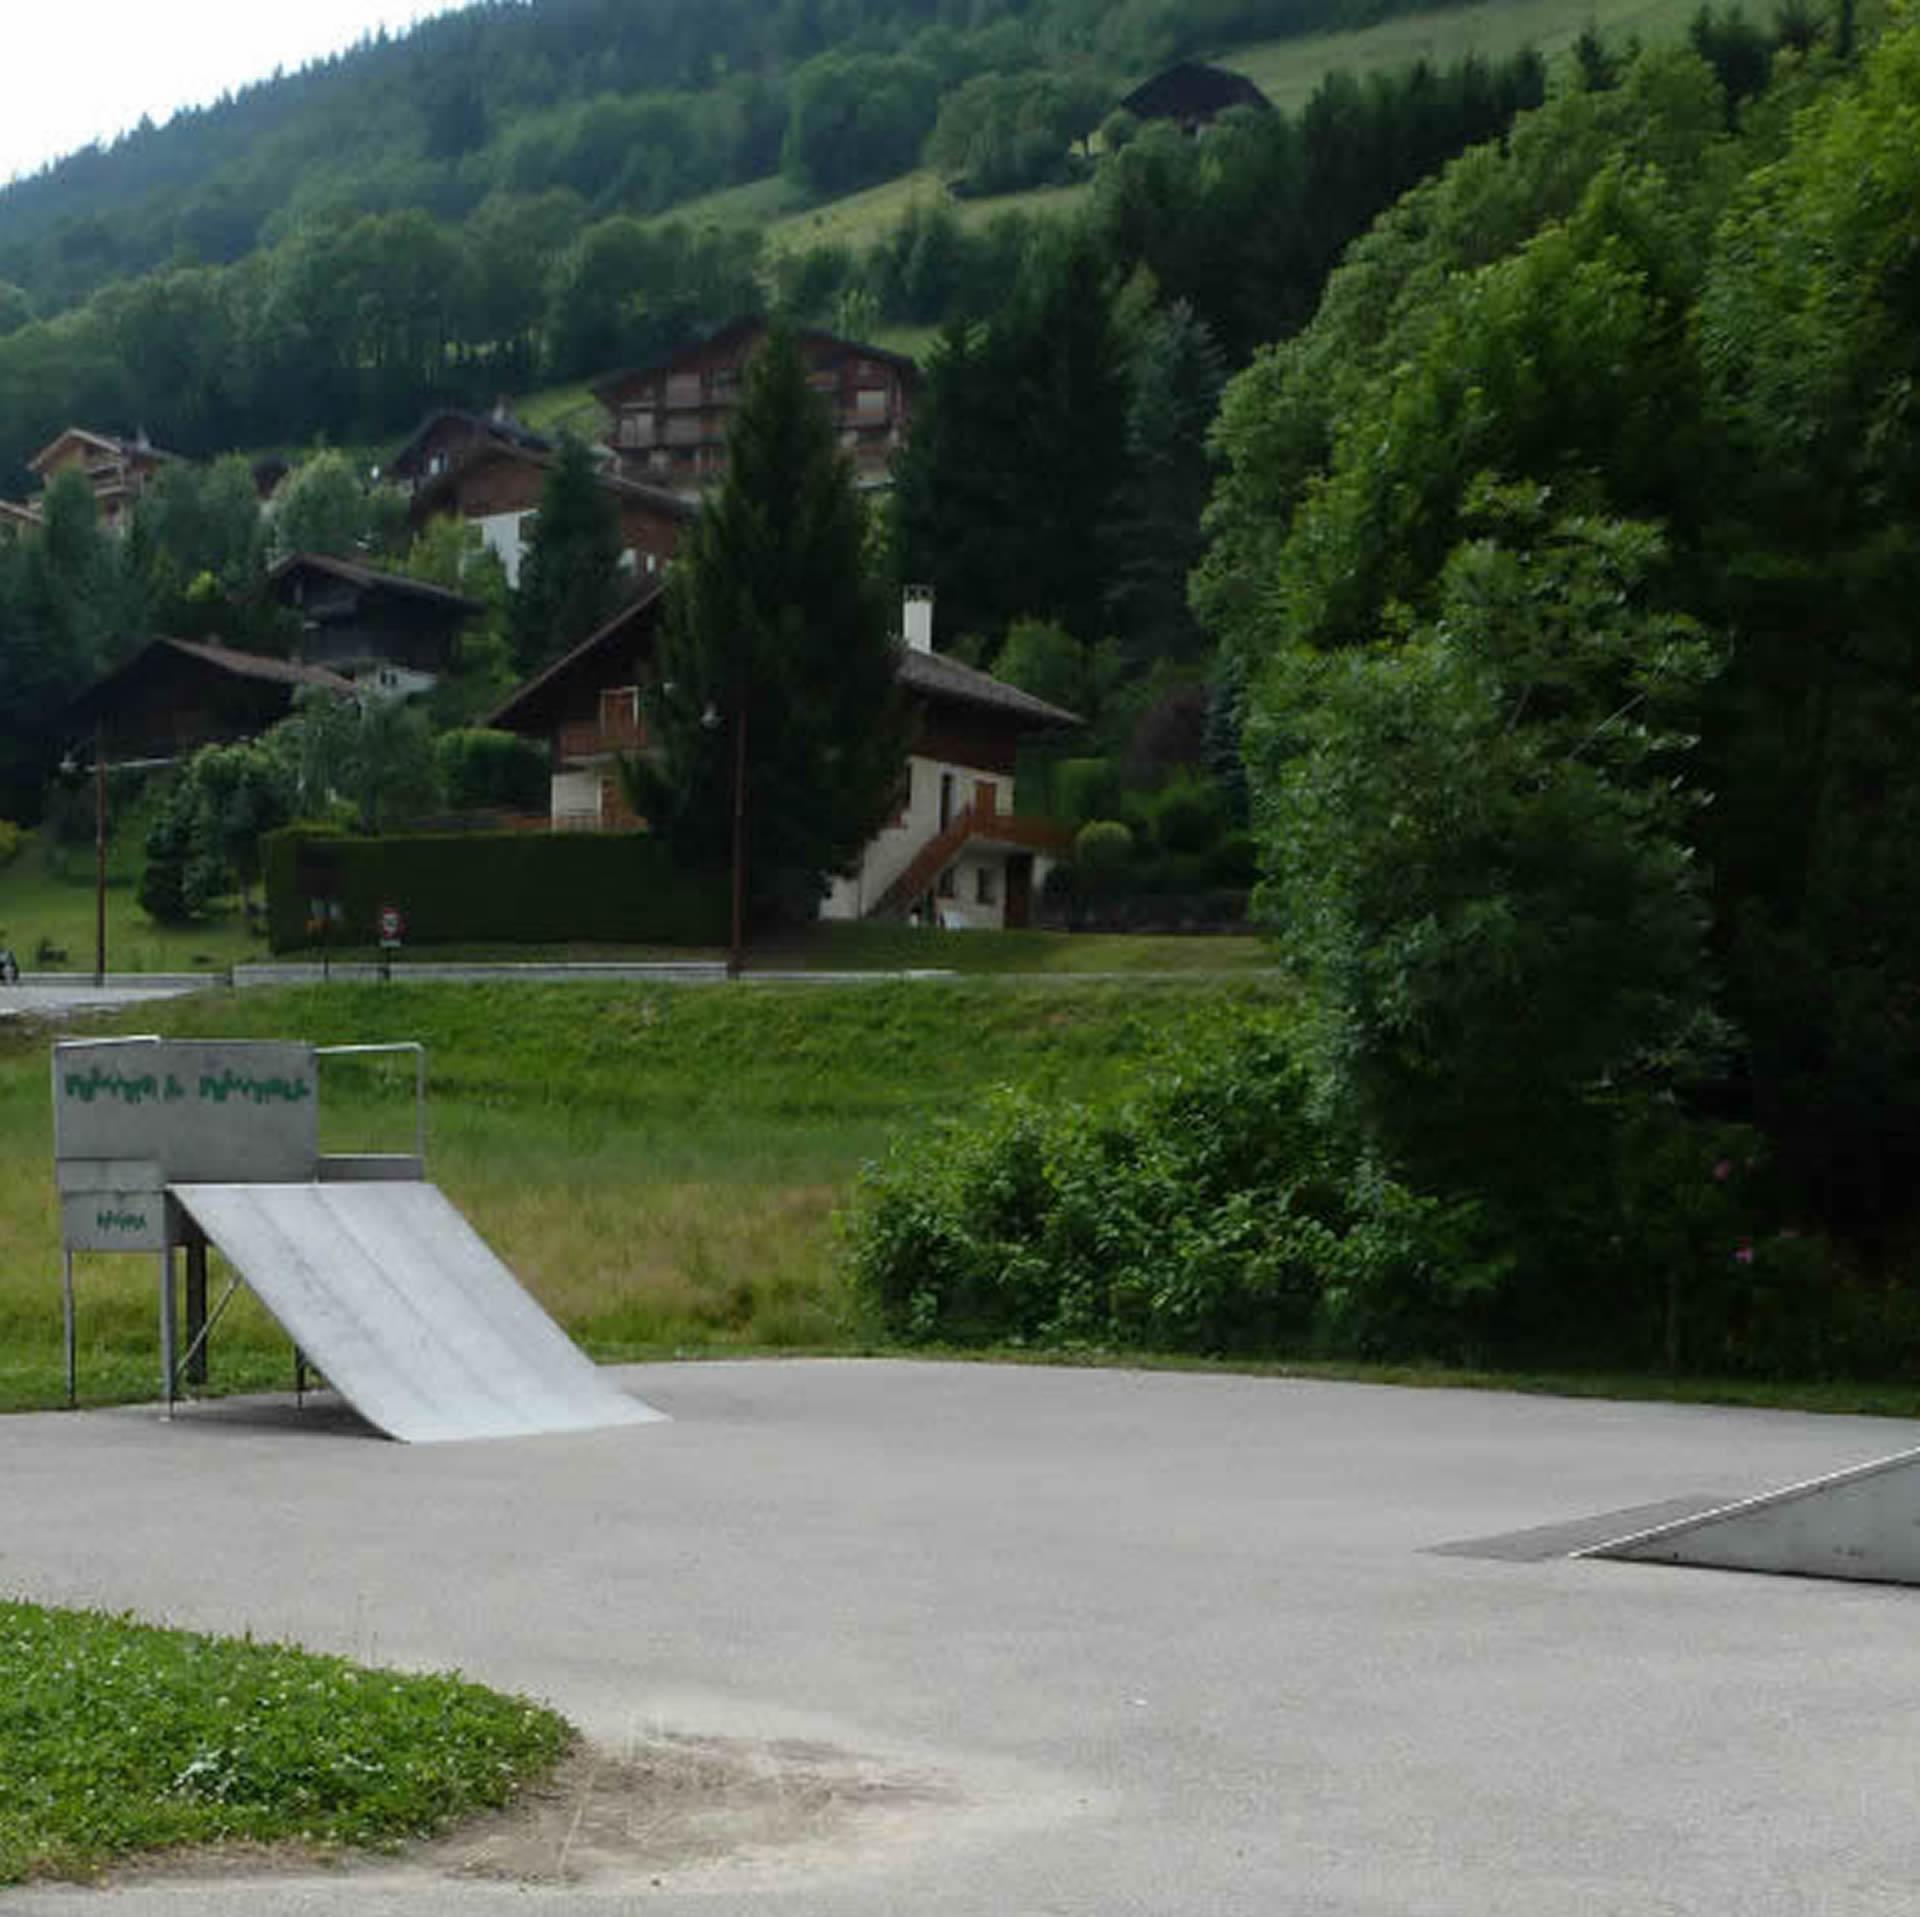 Skate Park - City Stade